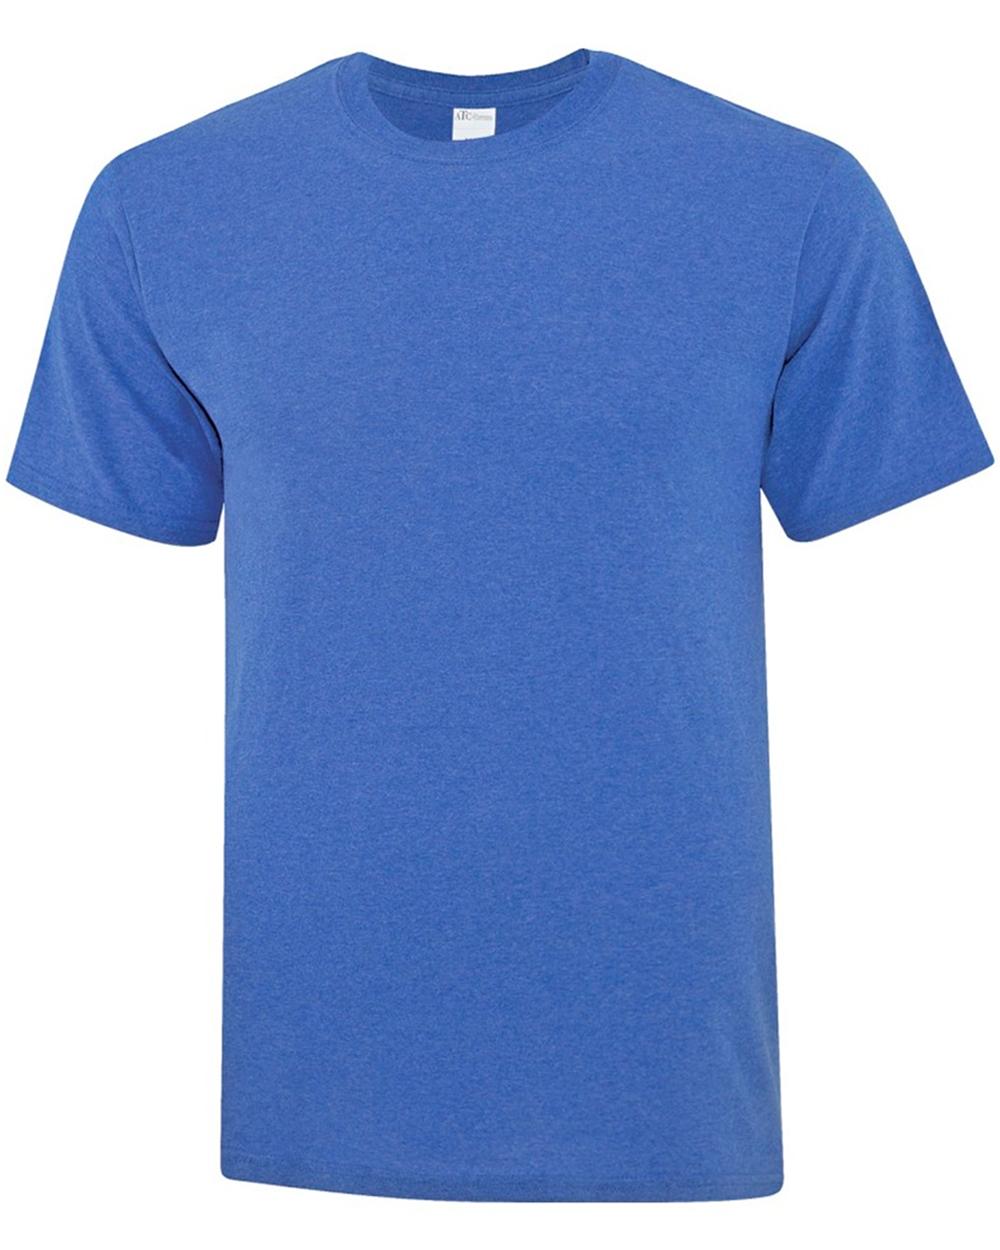 Everyday Cotton T-Shirt